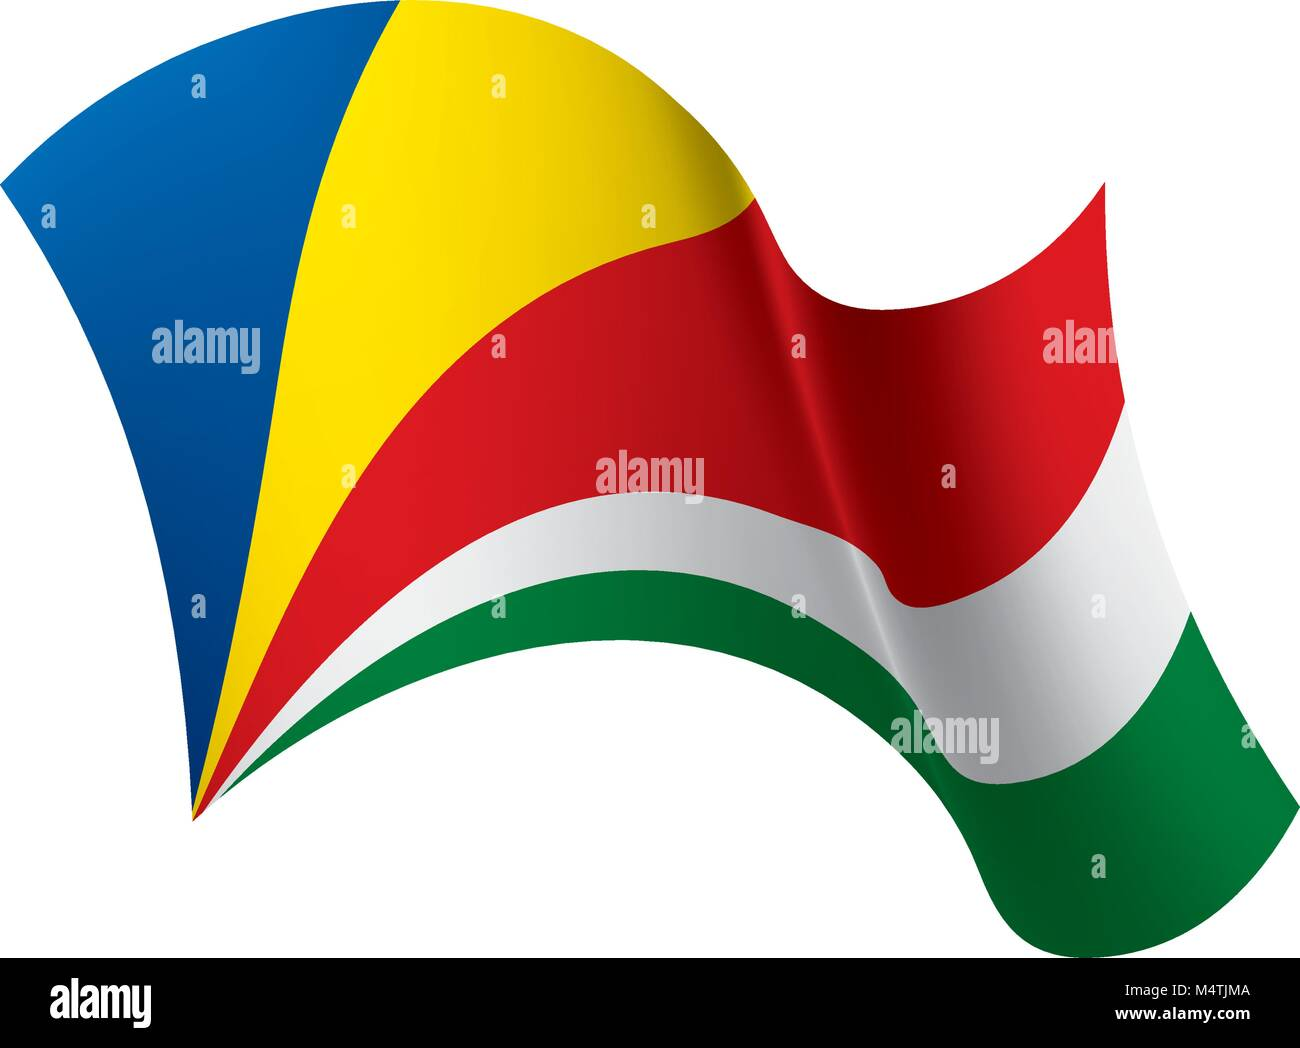 Seychelles flag, vector illustration - Stock Image